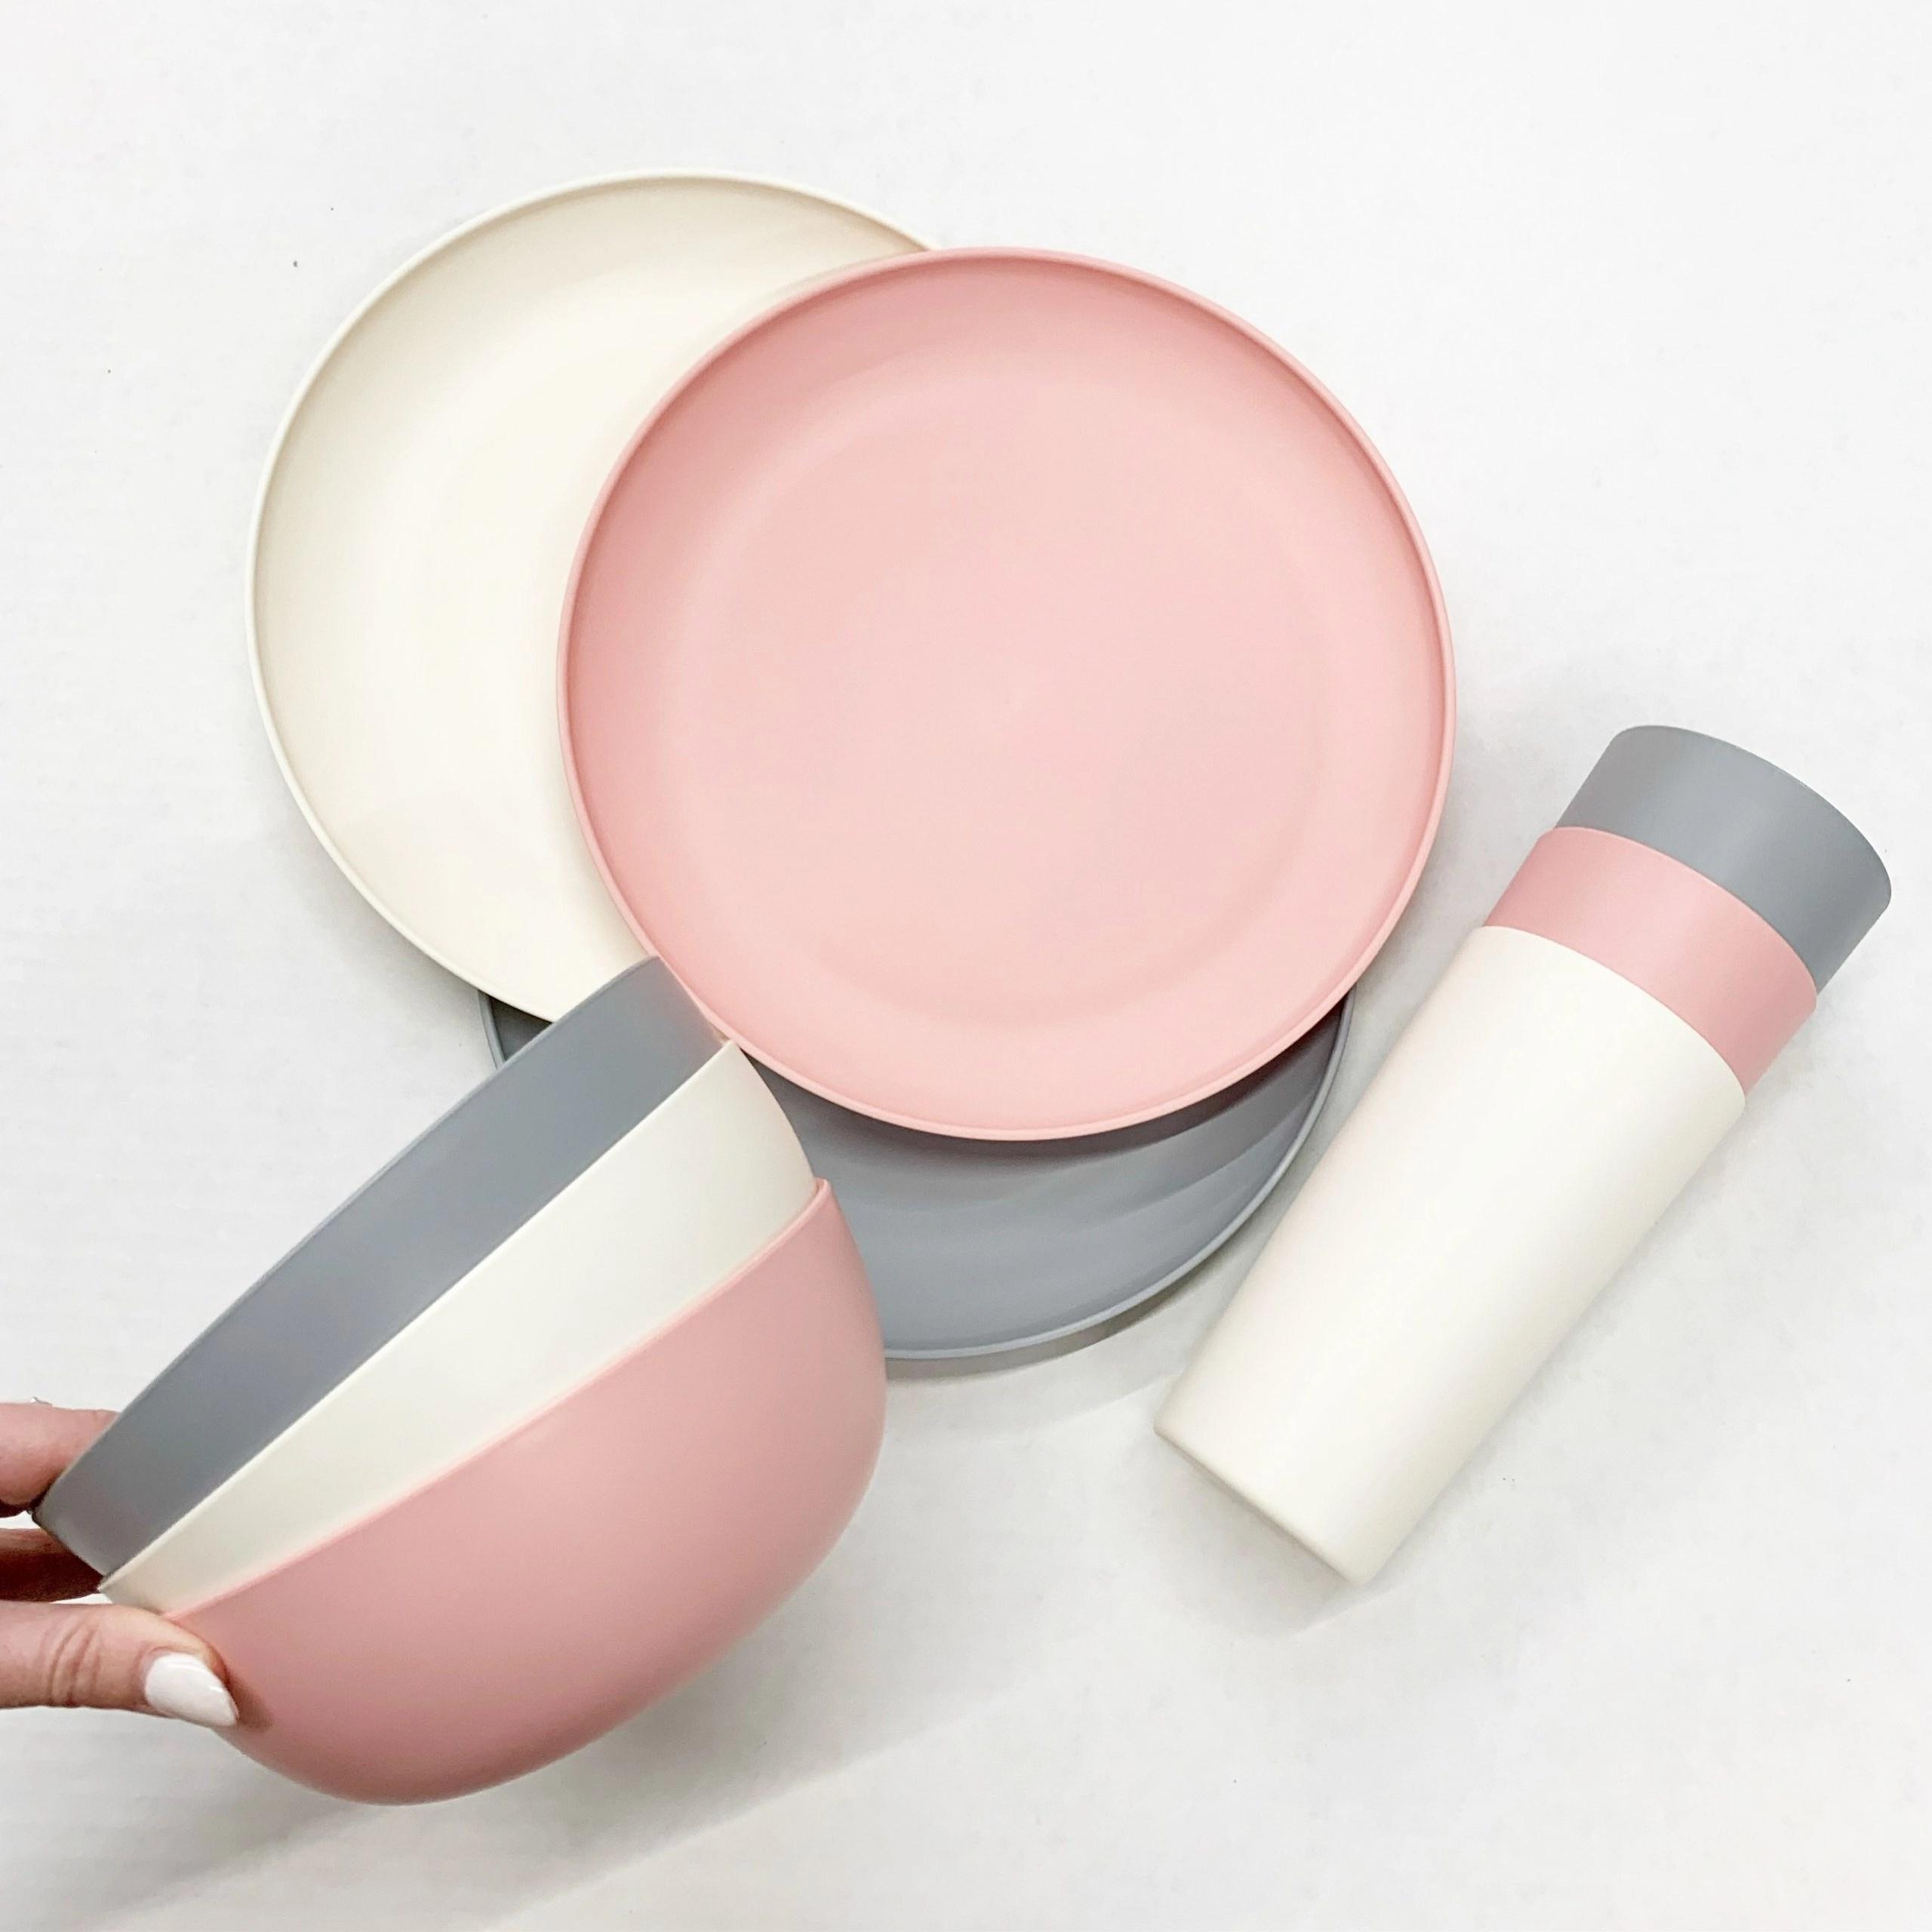 Mainstays 50 Cent Plastic Dinnerware